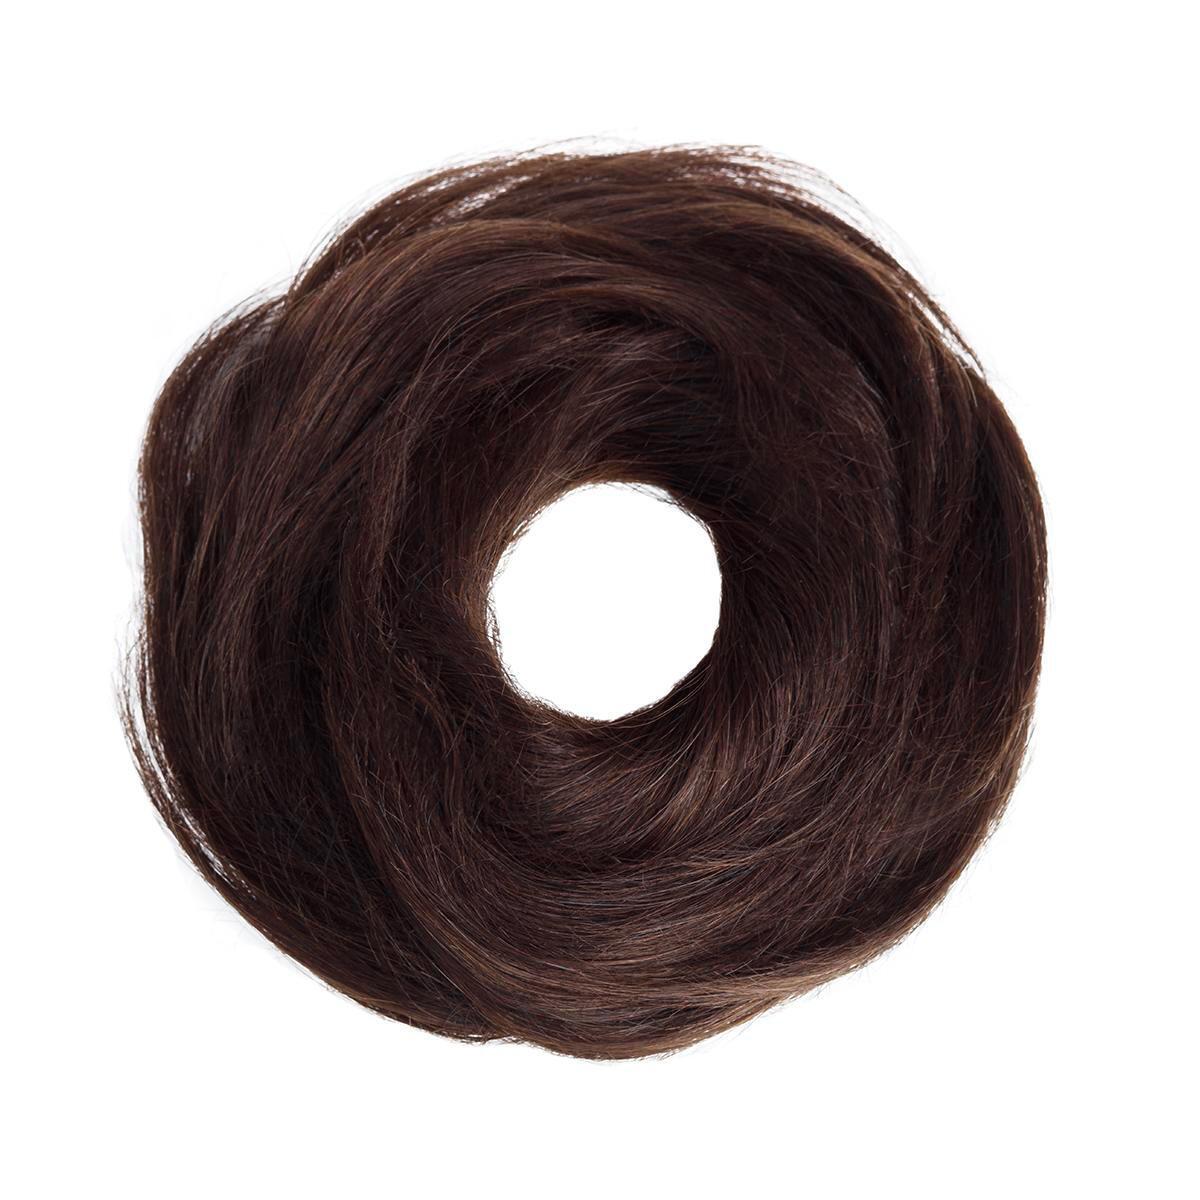 Volume Hair Scrunchie 2.3 Chocolate Brown 0 cm